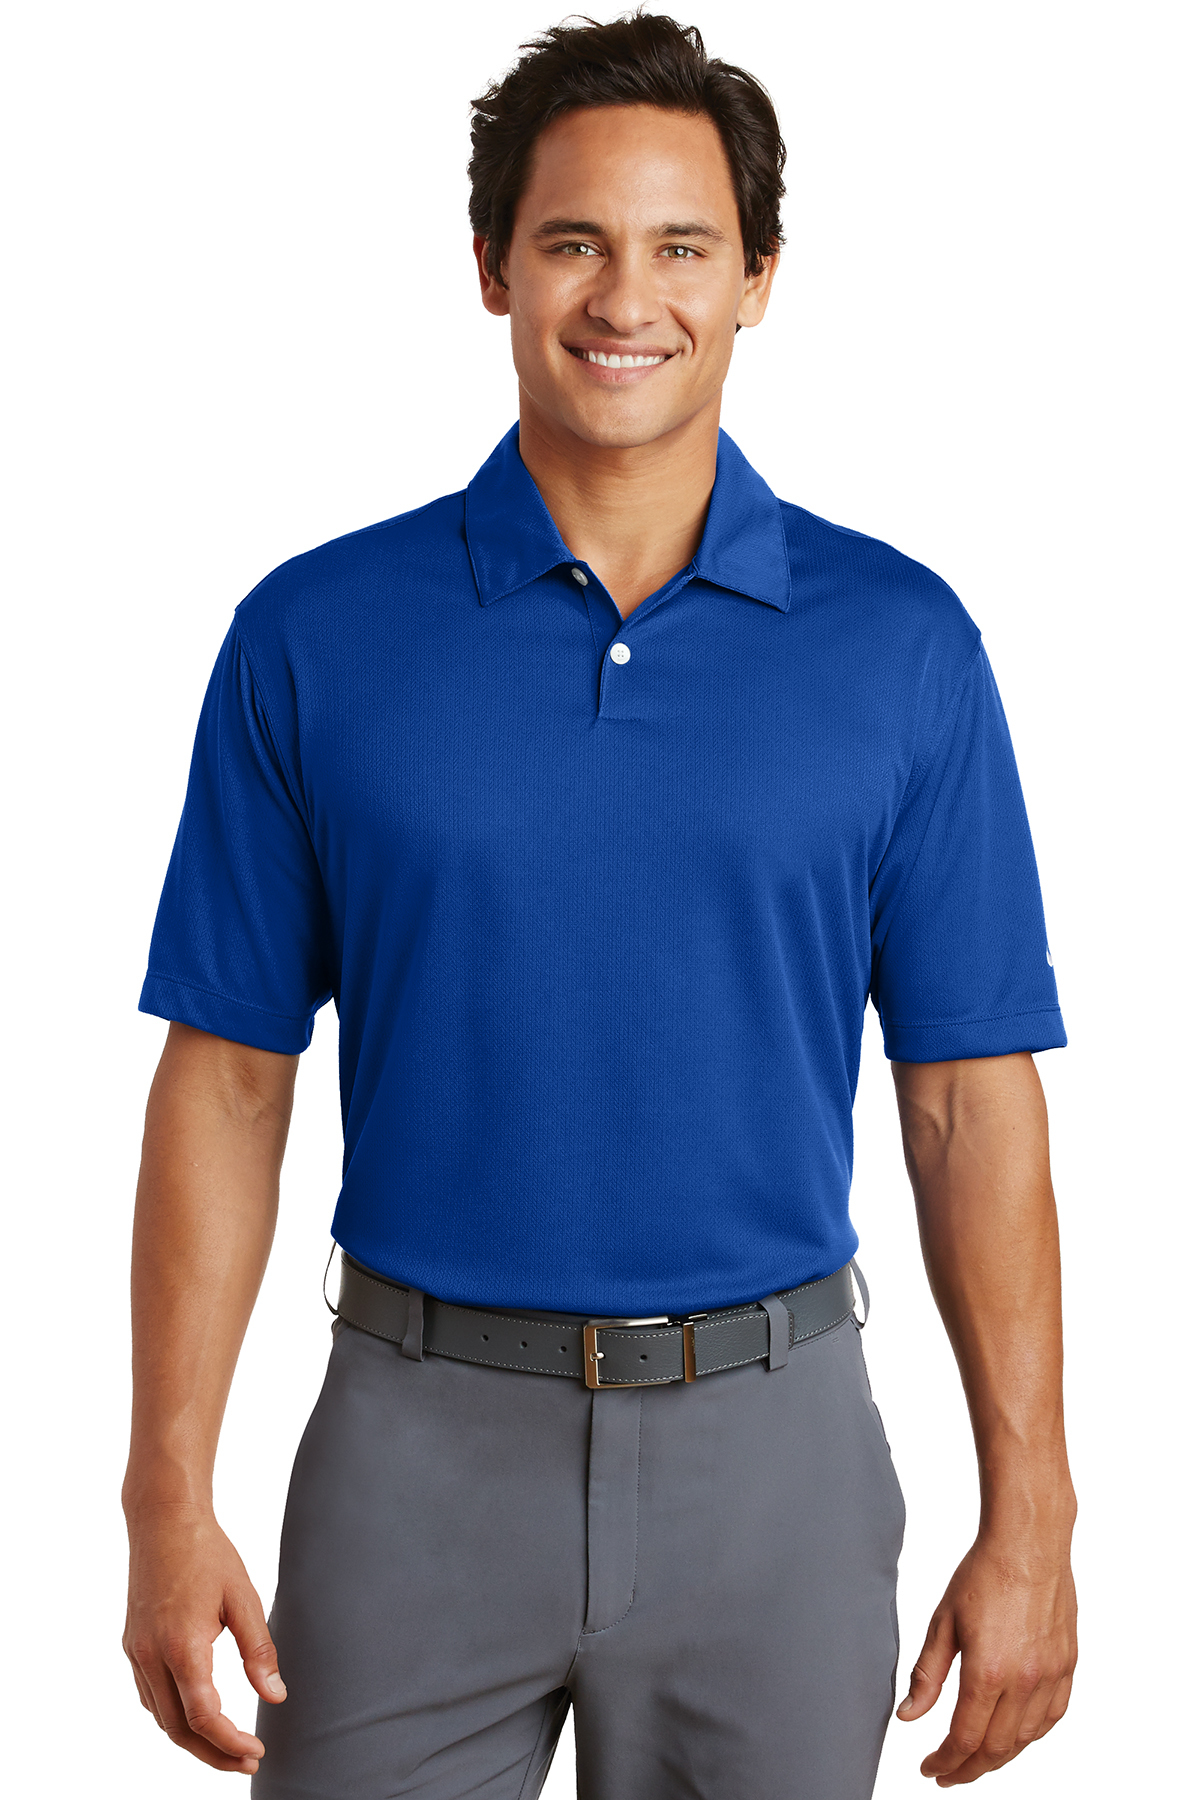 Nike Golf - Dri-FIT Pebble Texture Polo. 373749